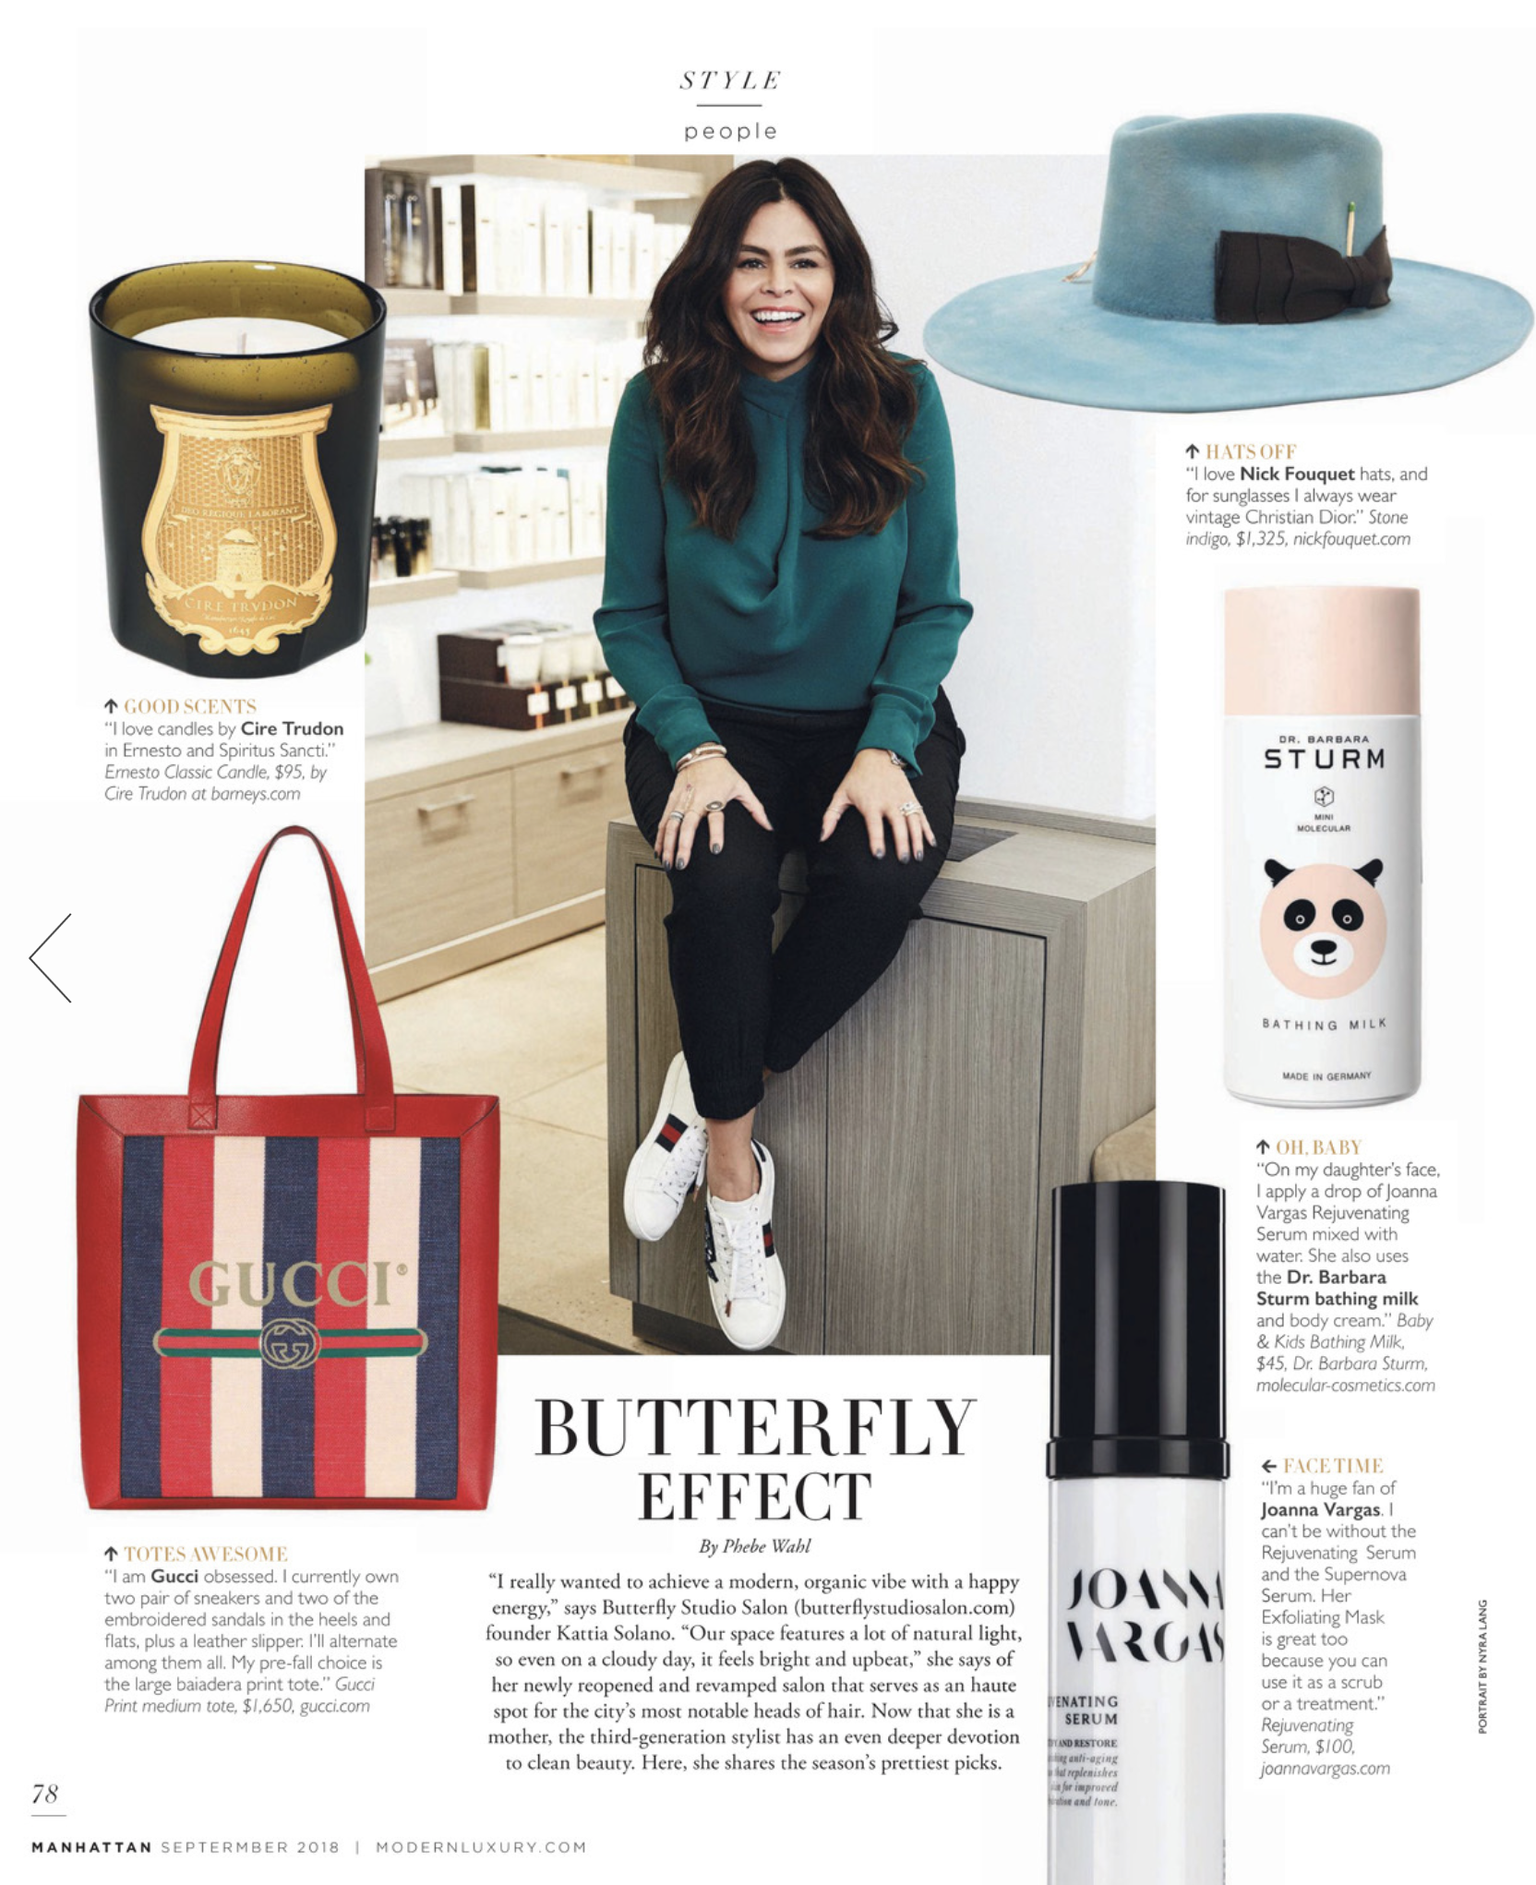 MODERNLUXURY.COM  Kattia Solano is featured in Modern Luxury. Full page spread on Solano's beauty favorites.